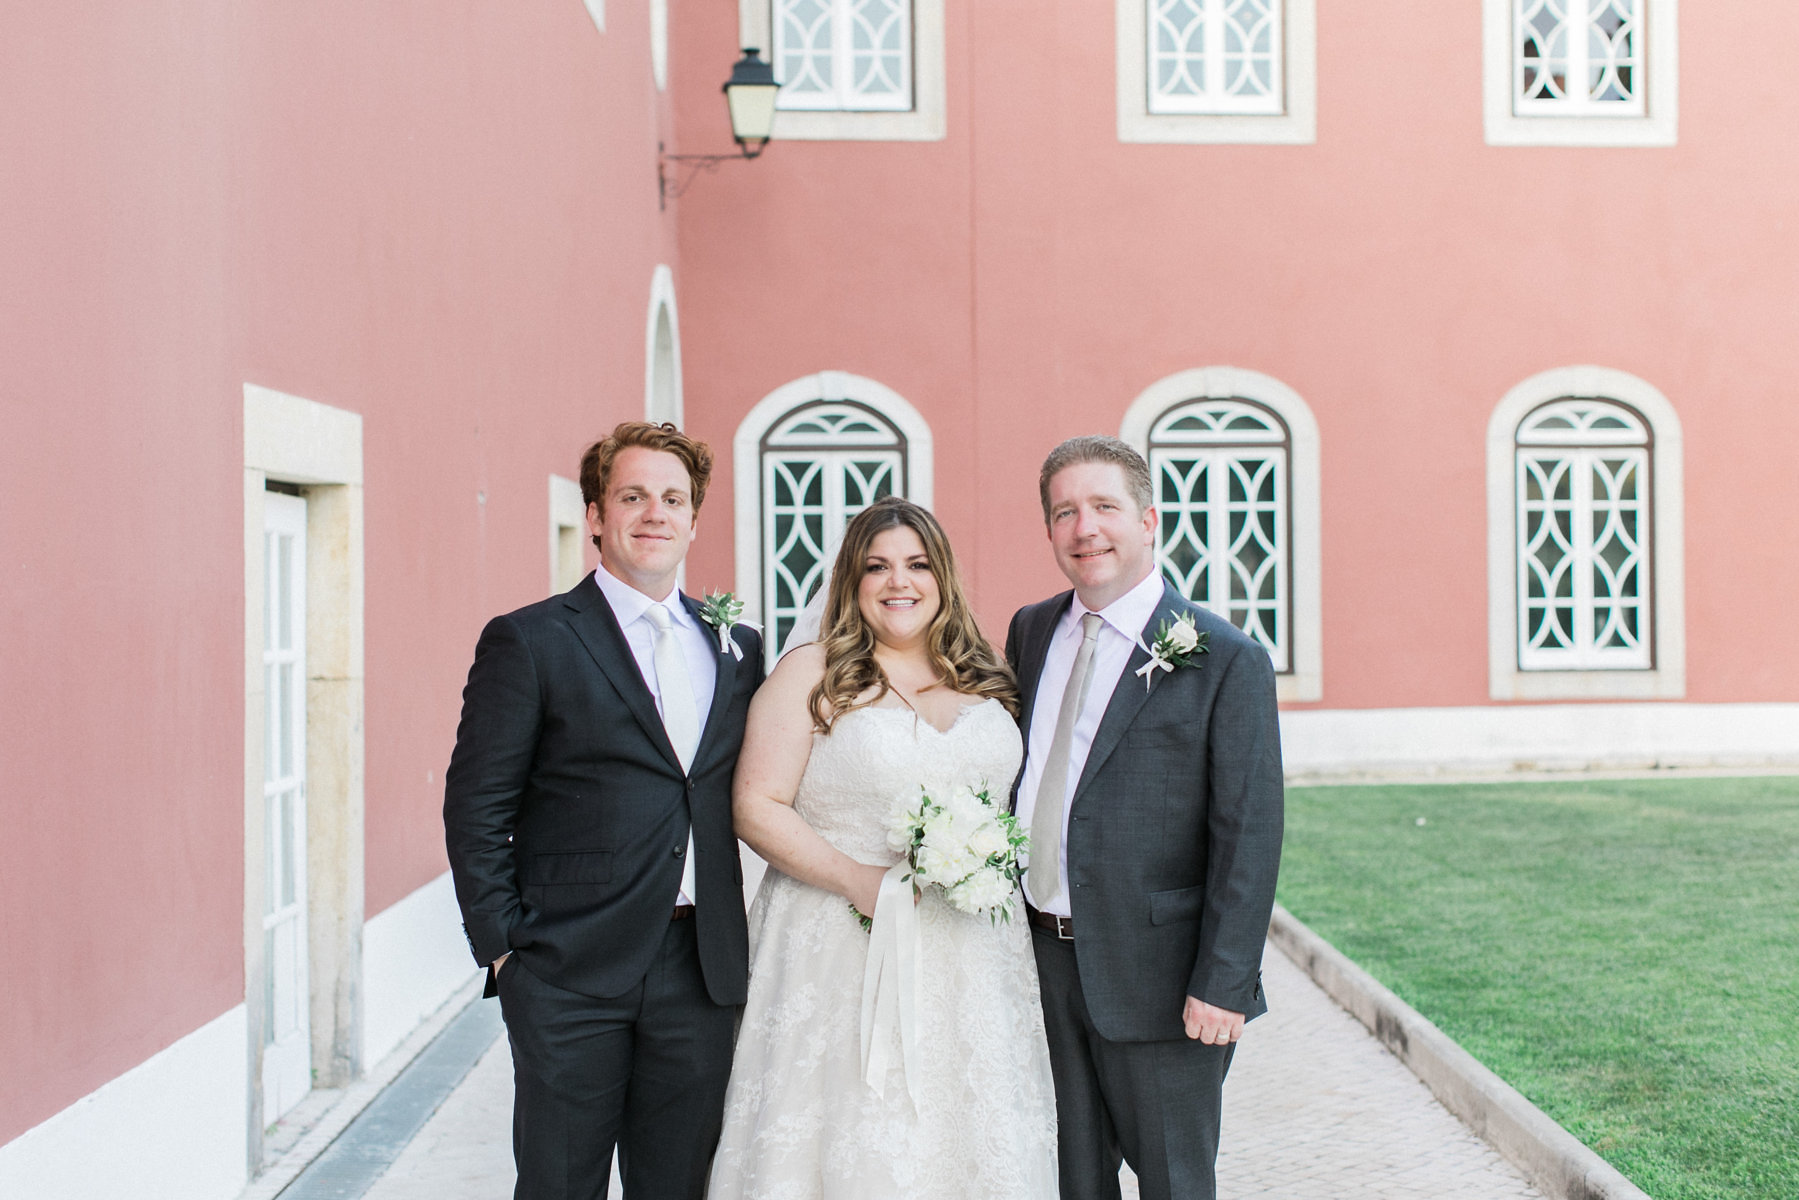 mariaraophotography_portugalwedding-274web.JPG